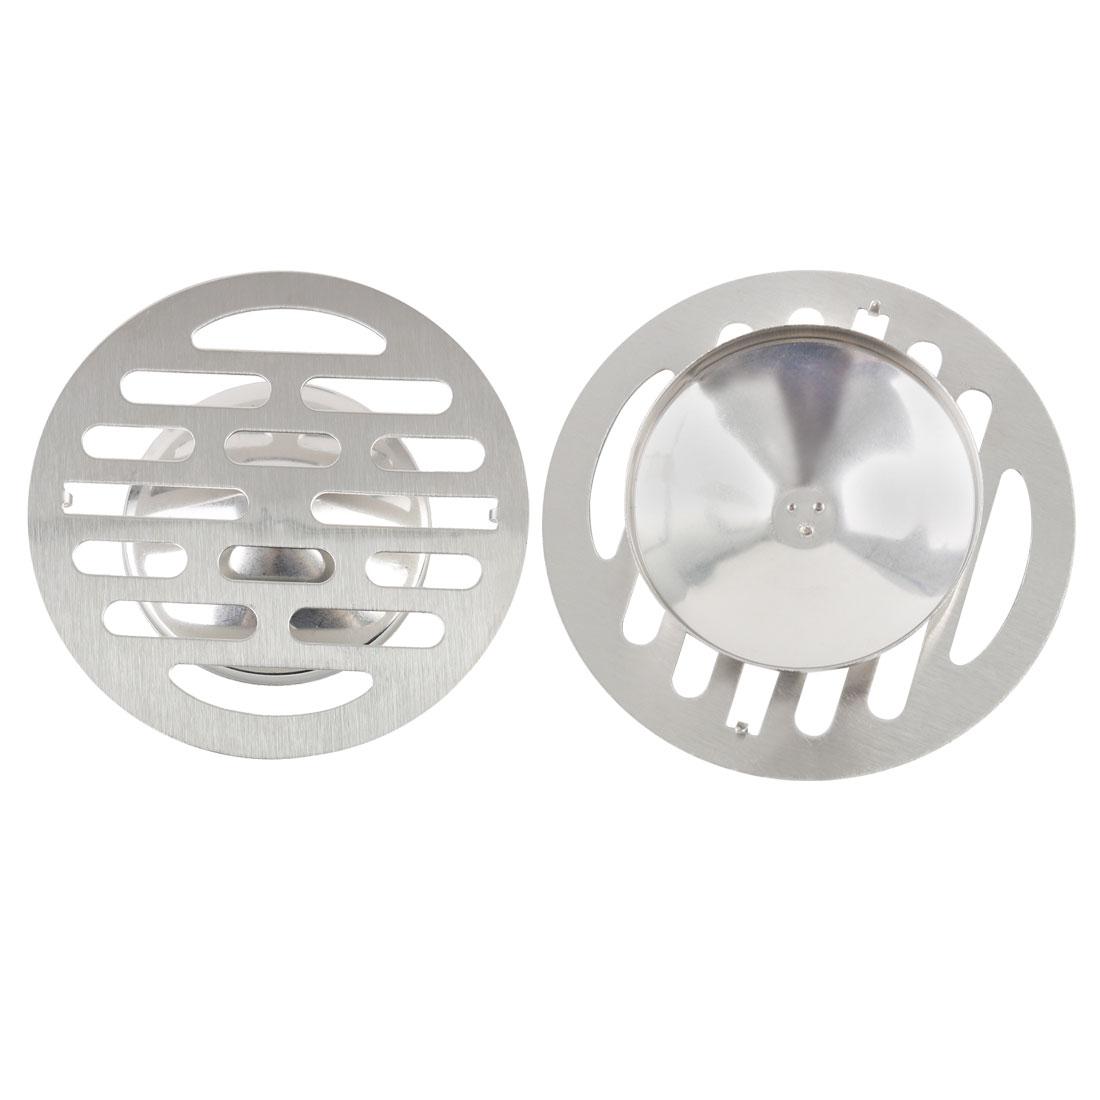 "2pcs 4.3"" Floor Drain Cover Hair Catcher Deodorant Sink Filter Bathroom Kitchen"